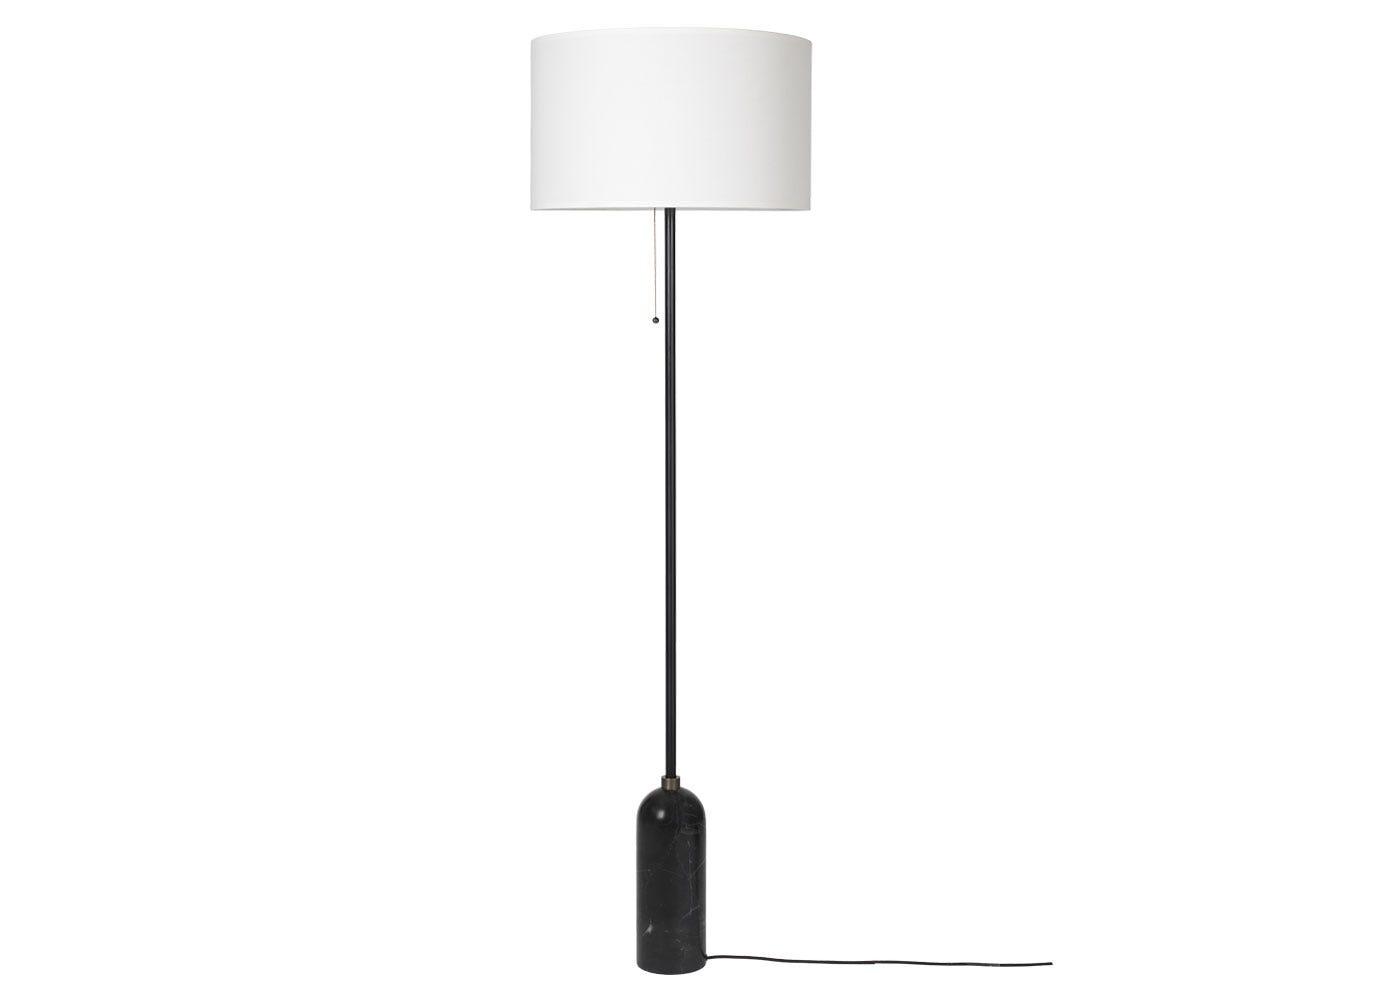 Gravity Floor Lamp Black Marble Base White Shade - Off